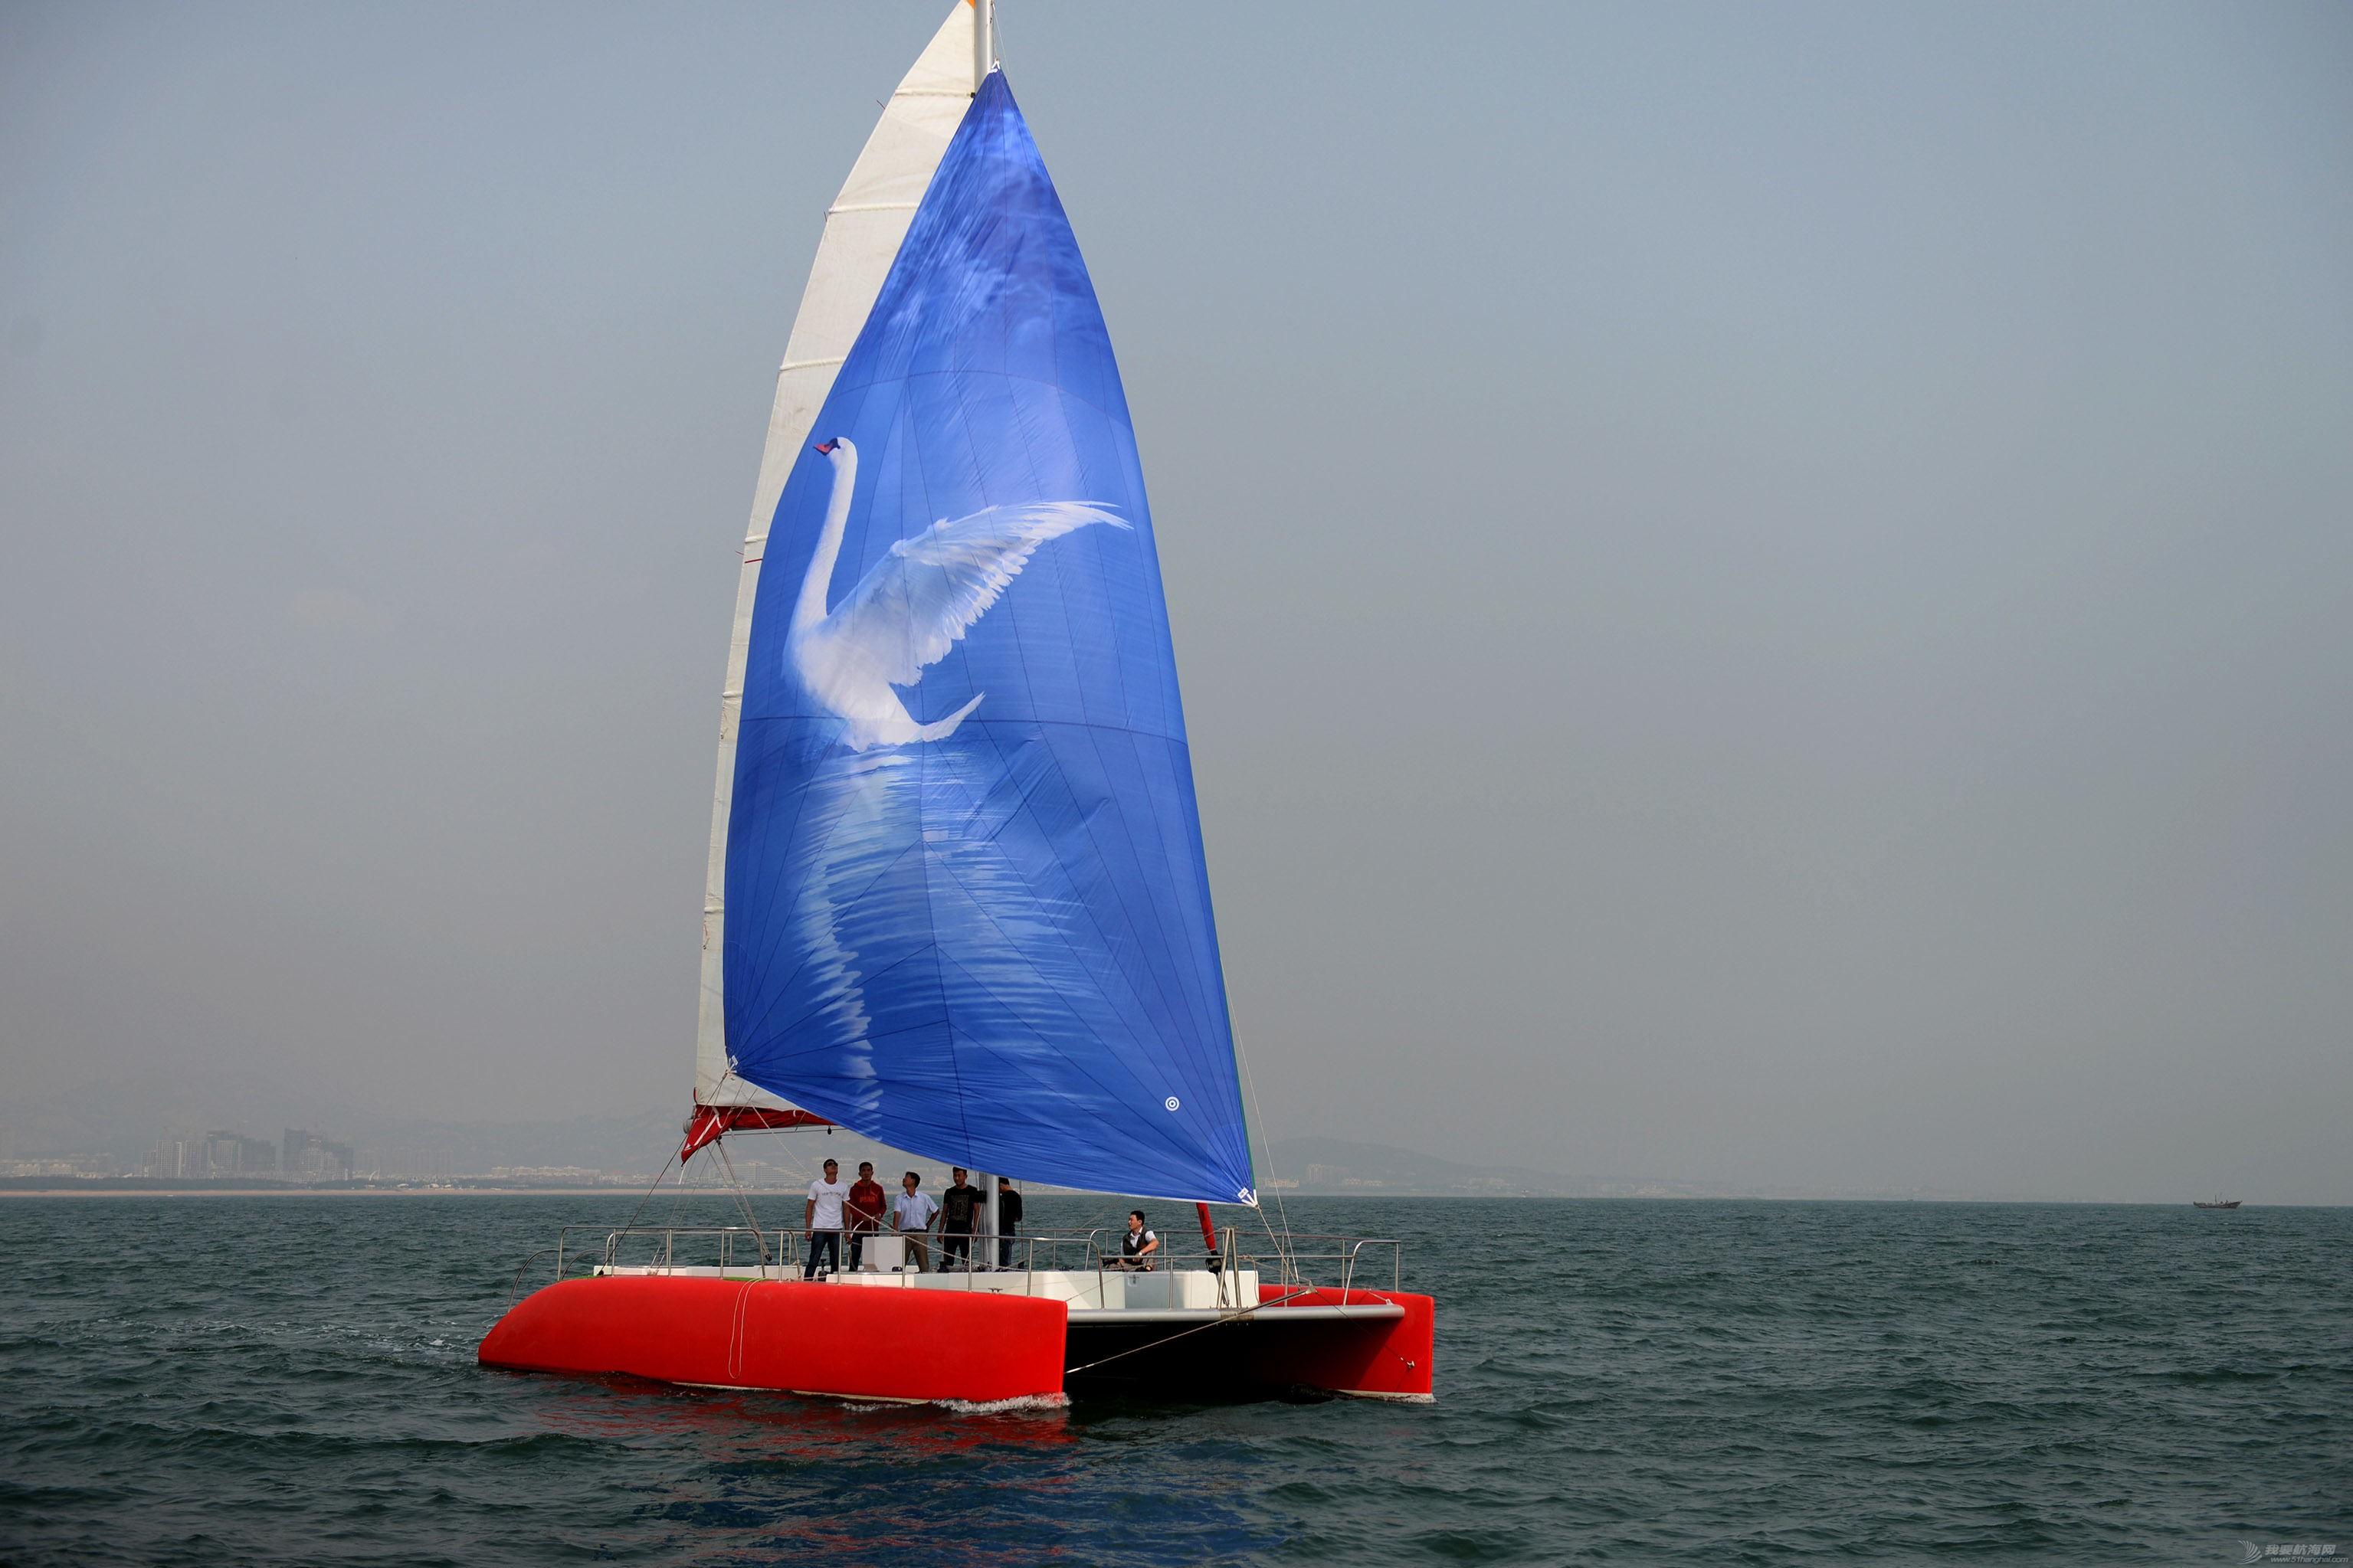 nbsp,帆船,平方米,想用,服务 40英尺双体帆船  212519ntdnlltt9z98t9i6